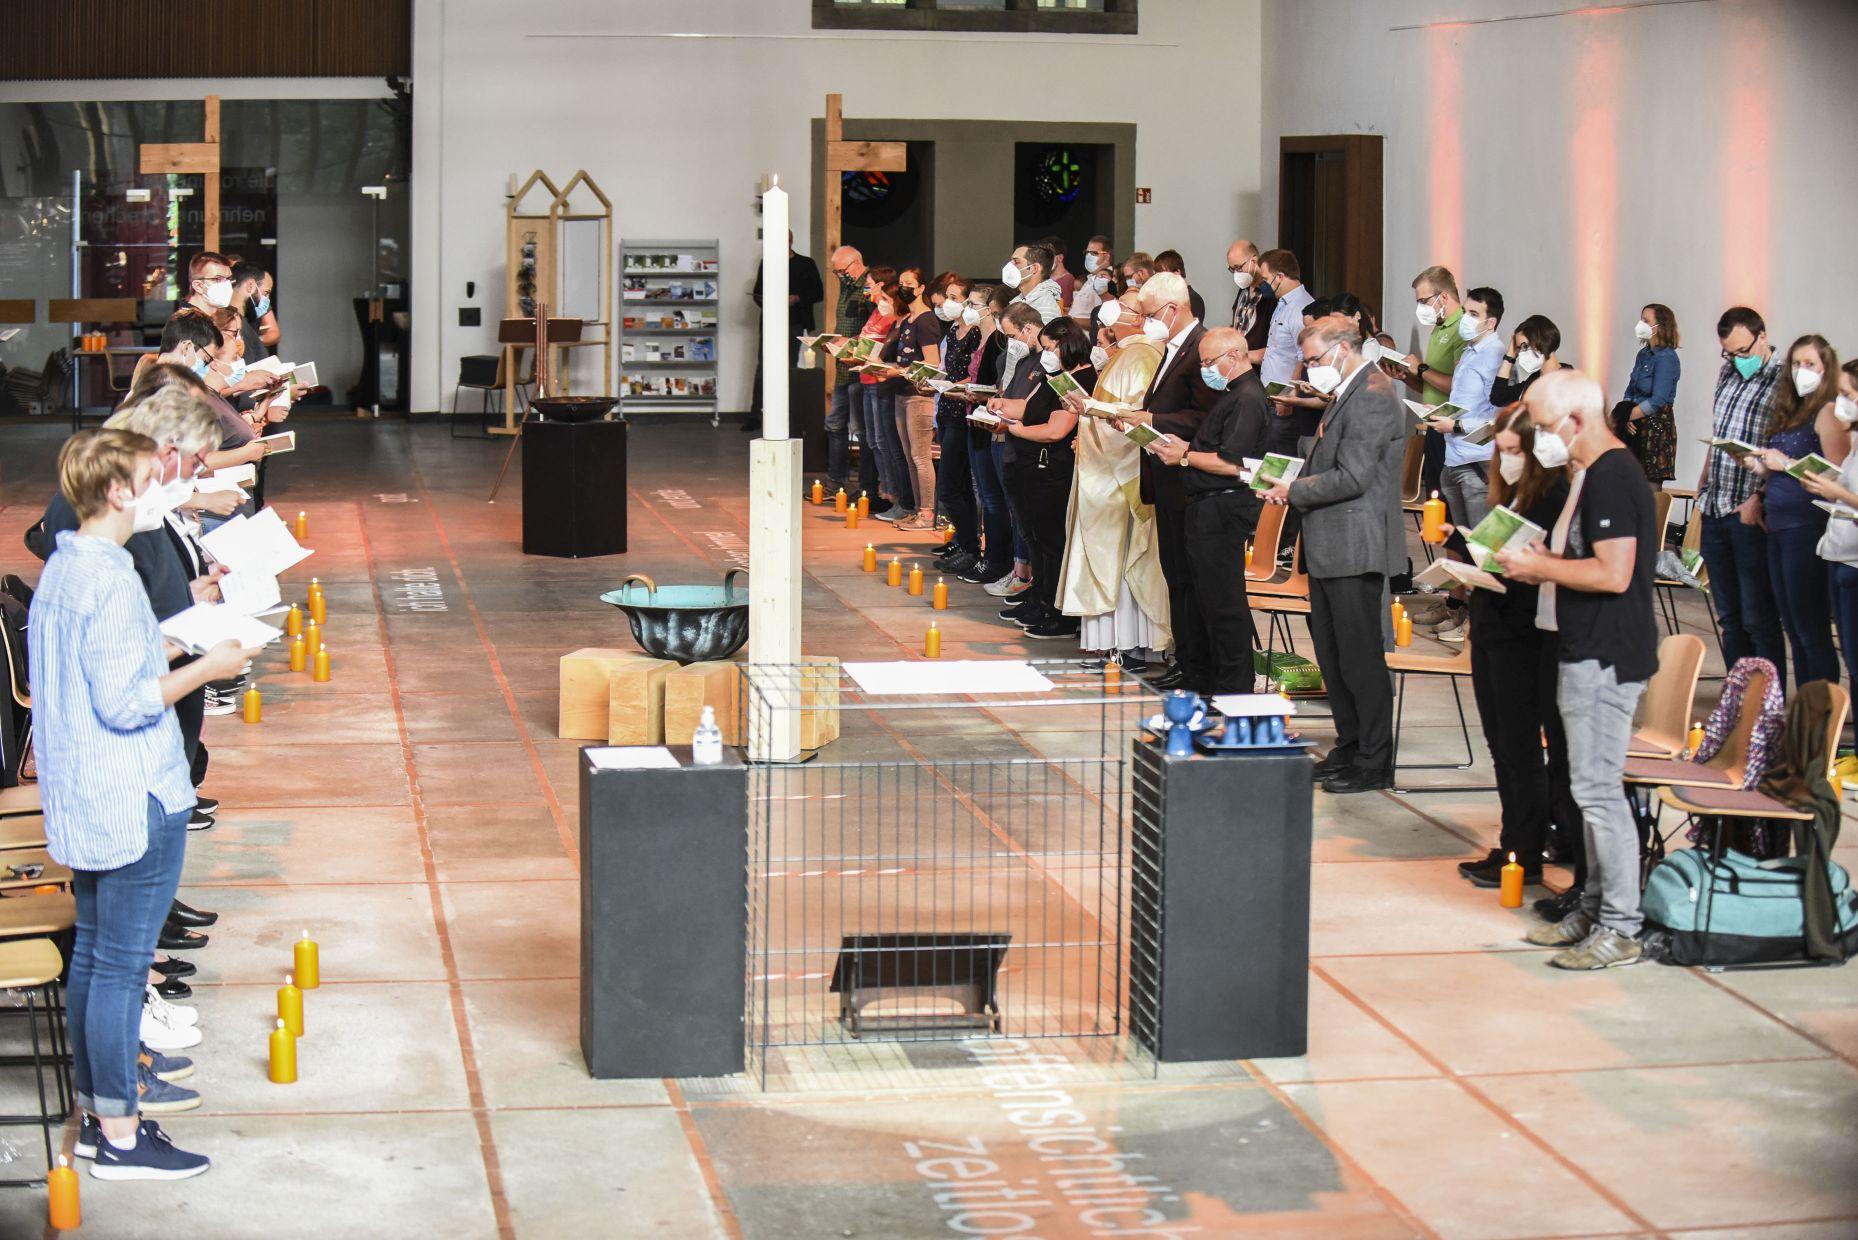 Jugendkirche Tabgha in Duisburg feierlich eröffnet